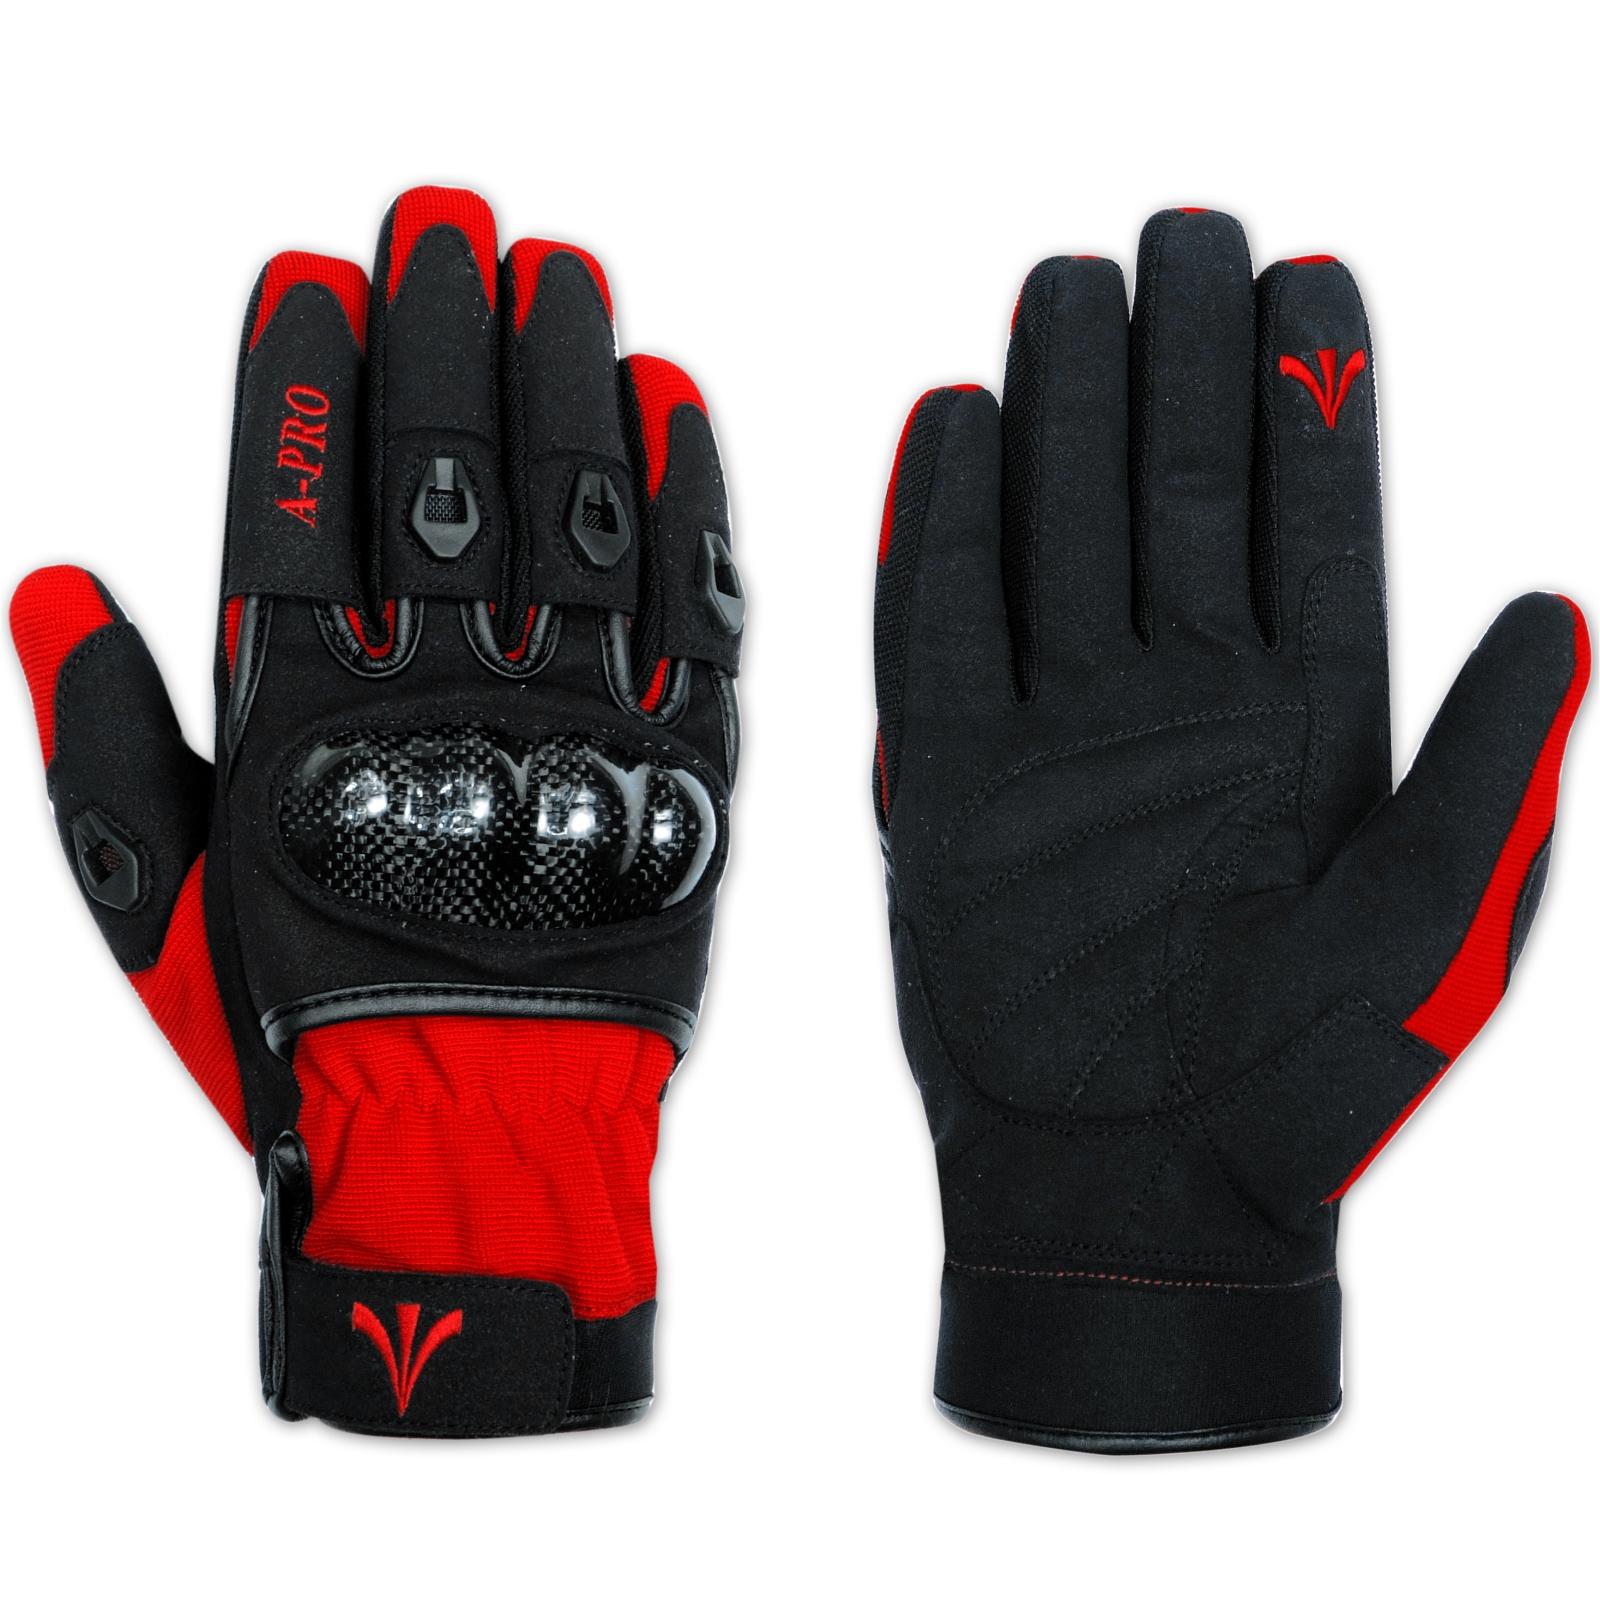 Moto-Guantes-Tela-Protectores-Carbono-Tejido-Tecnico-Transpirable-Sport